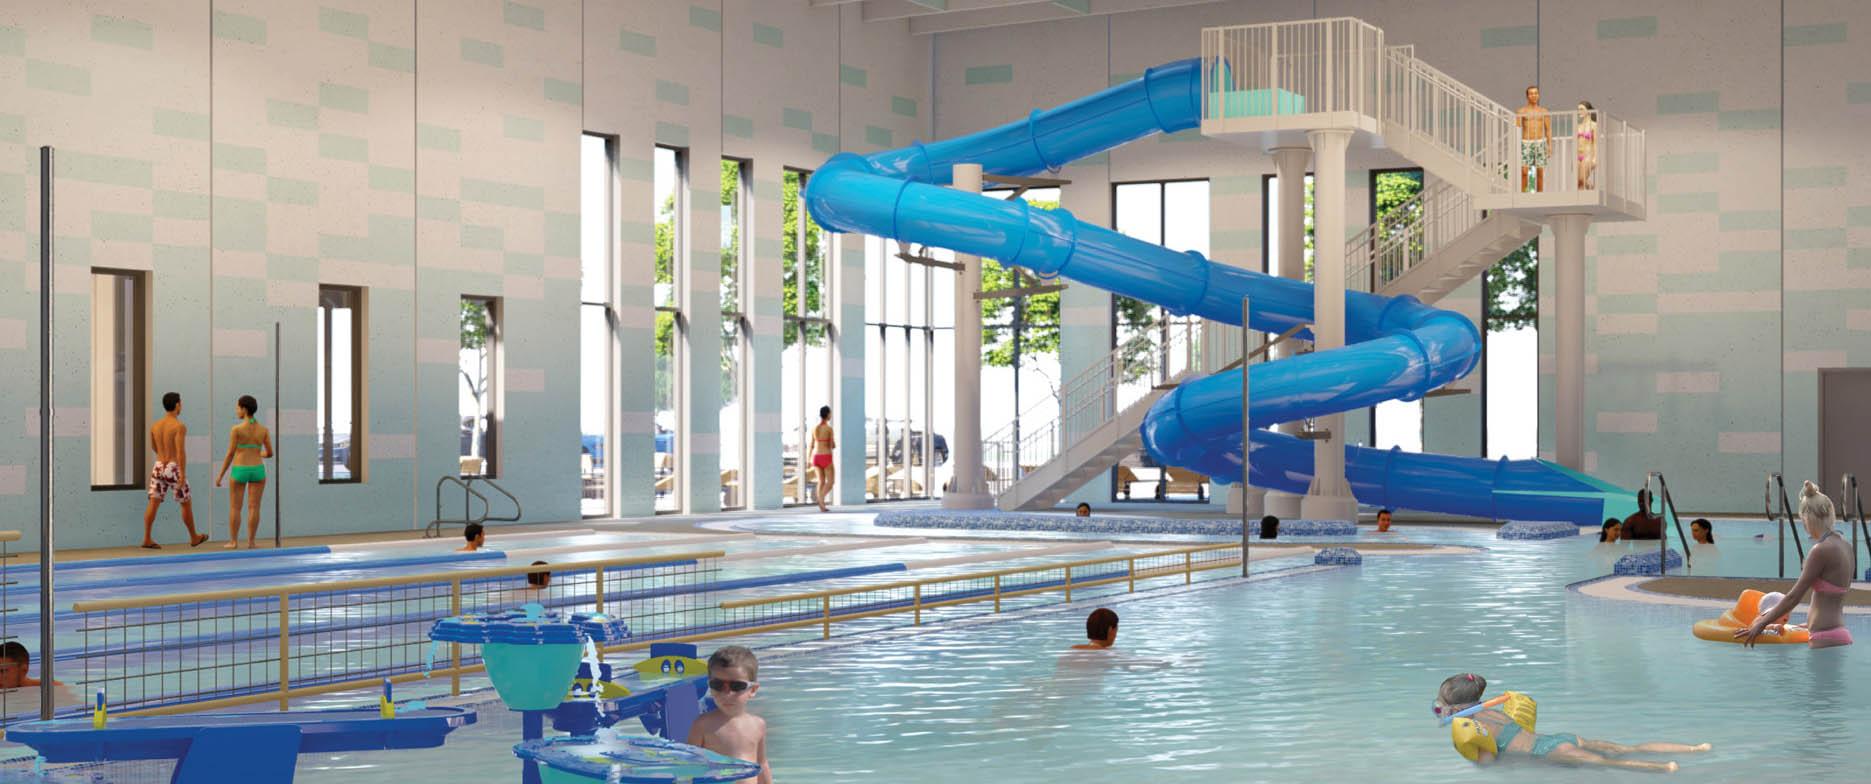 Heckart Community Center pool photo